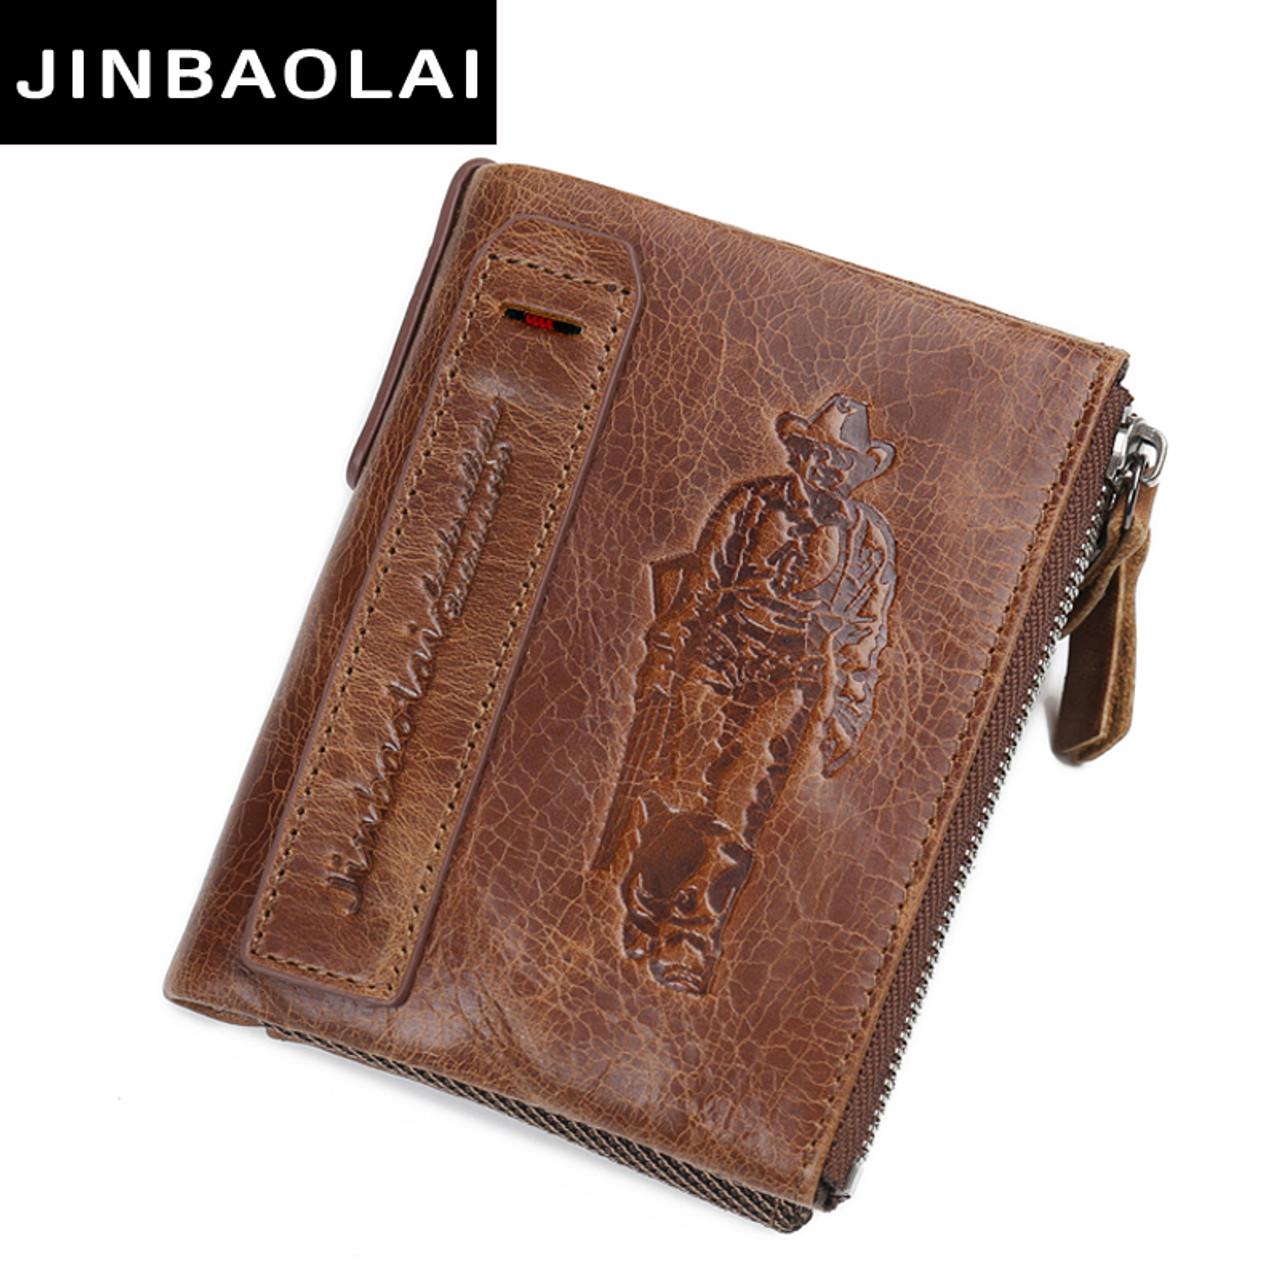 1708a032354d 100% Genuine Leather Double Zipper Male Wallet Small MINI Men Wallet  Portomonee Design With Coin Purse Pocket Brand Carteira men